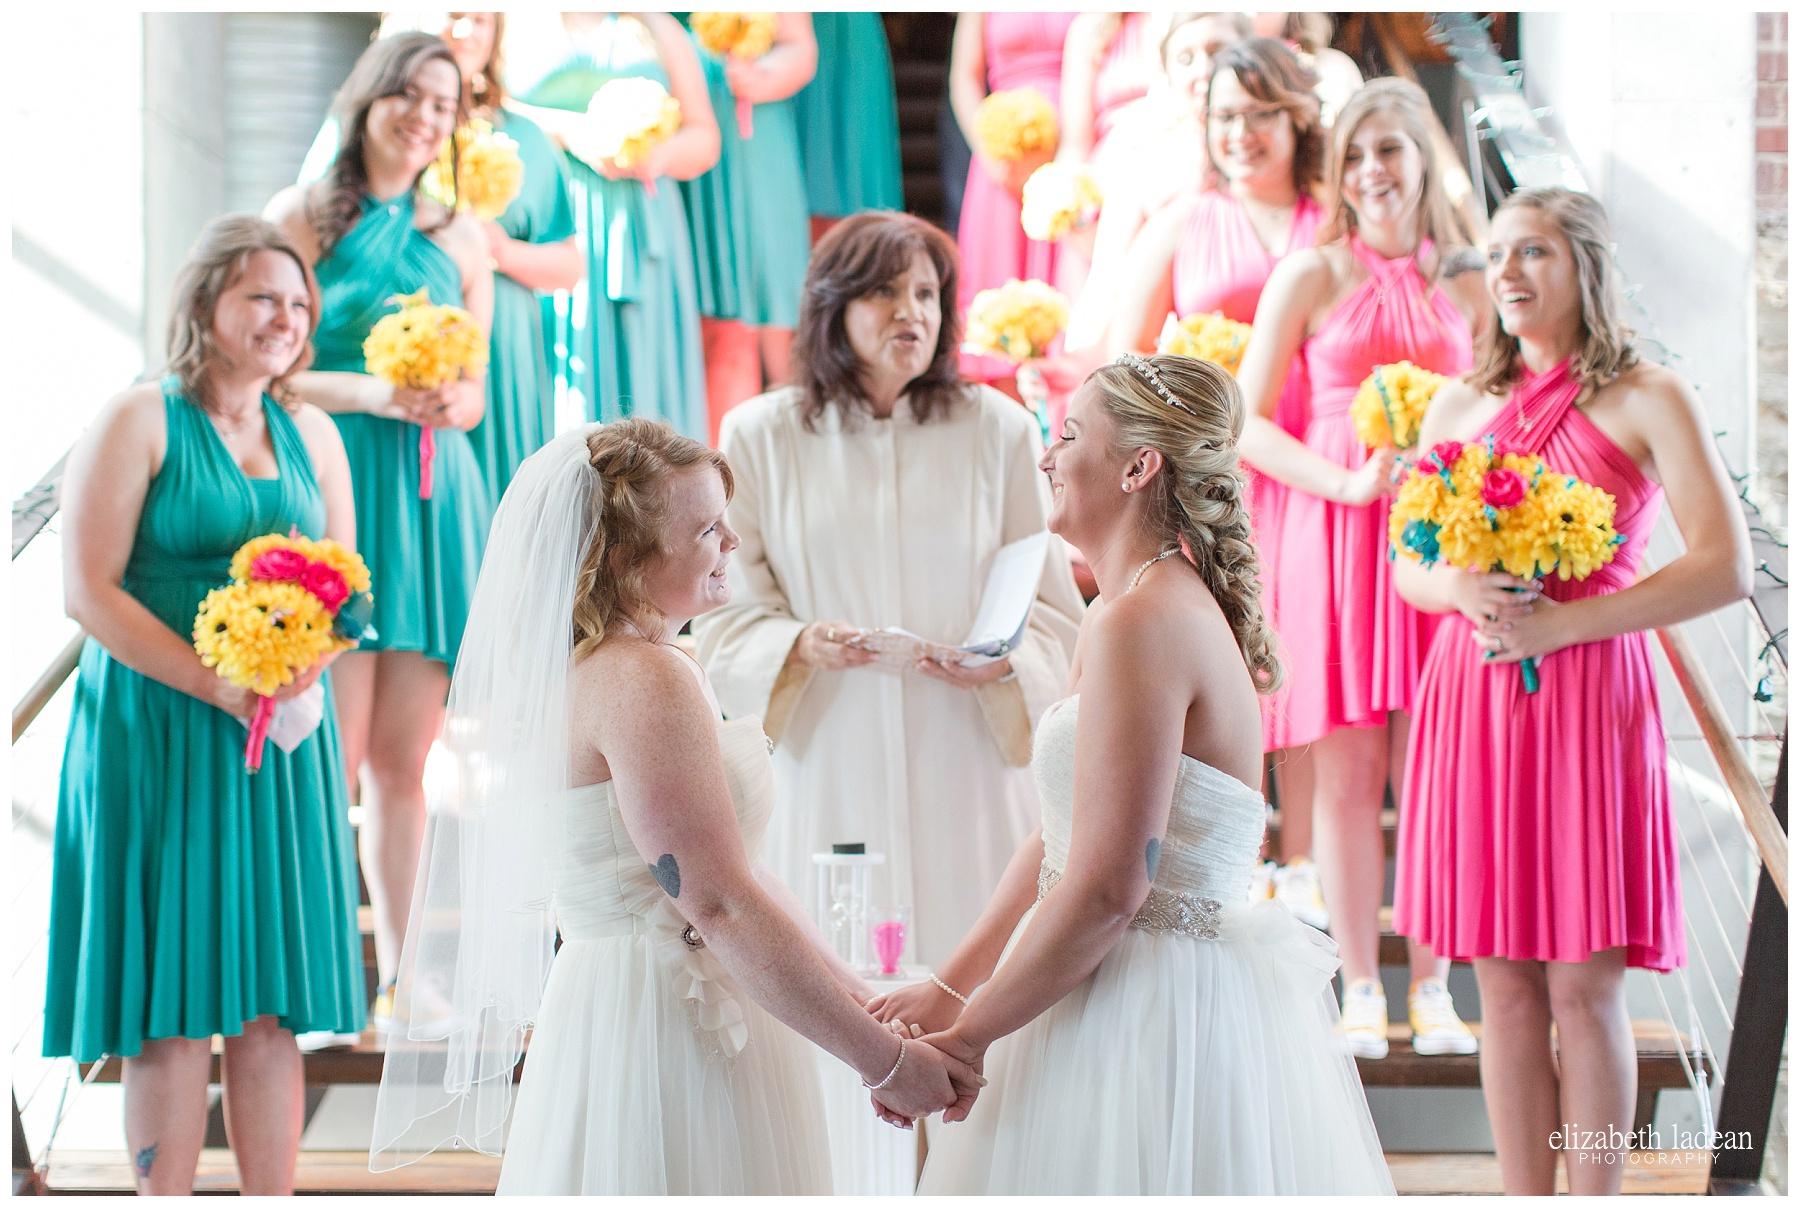 Wedding ceremony at Thompson Barn